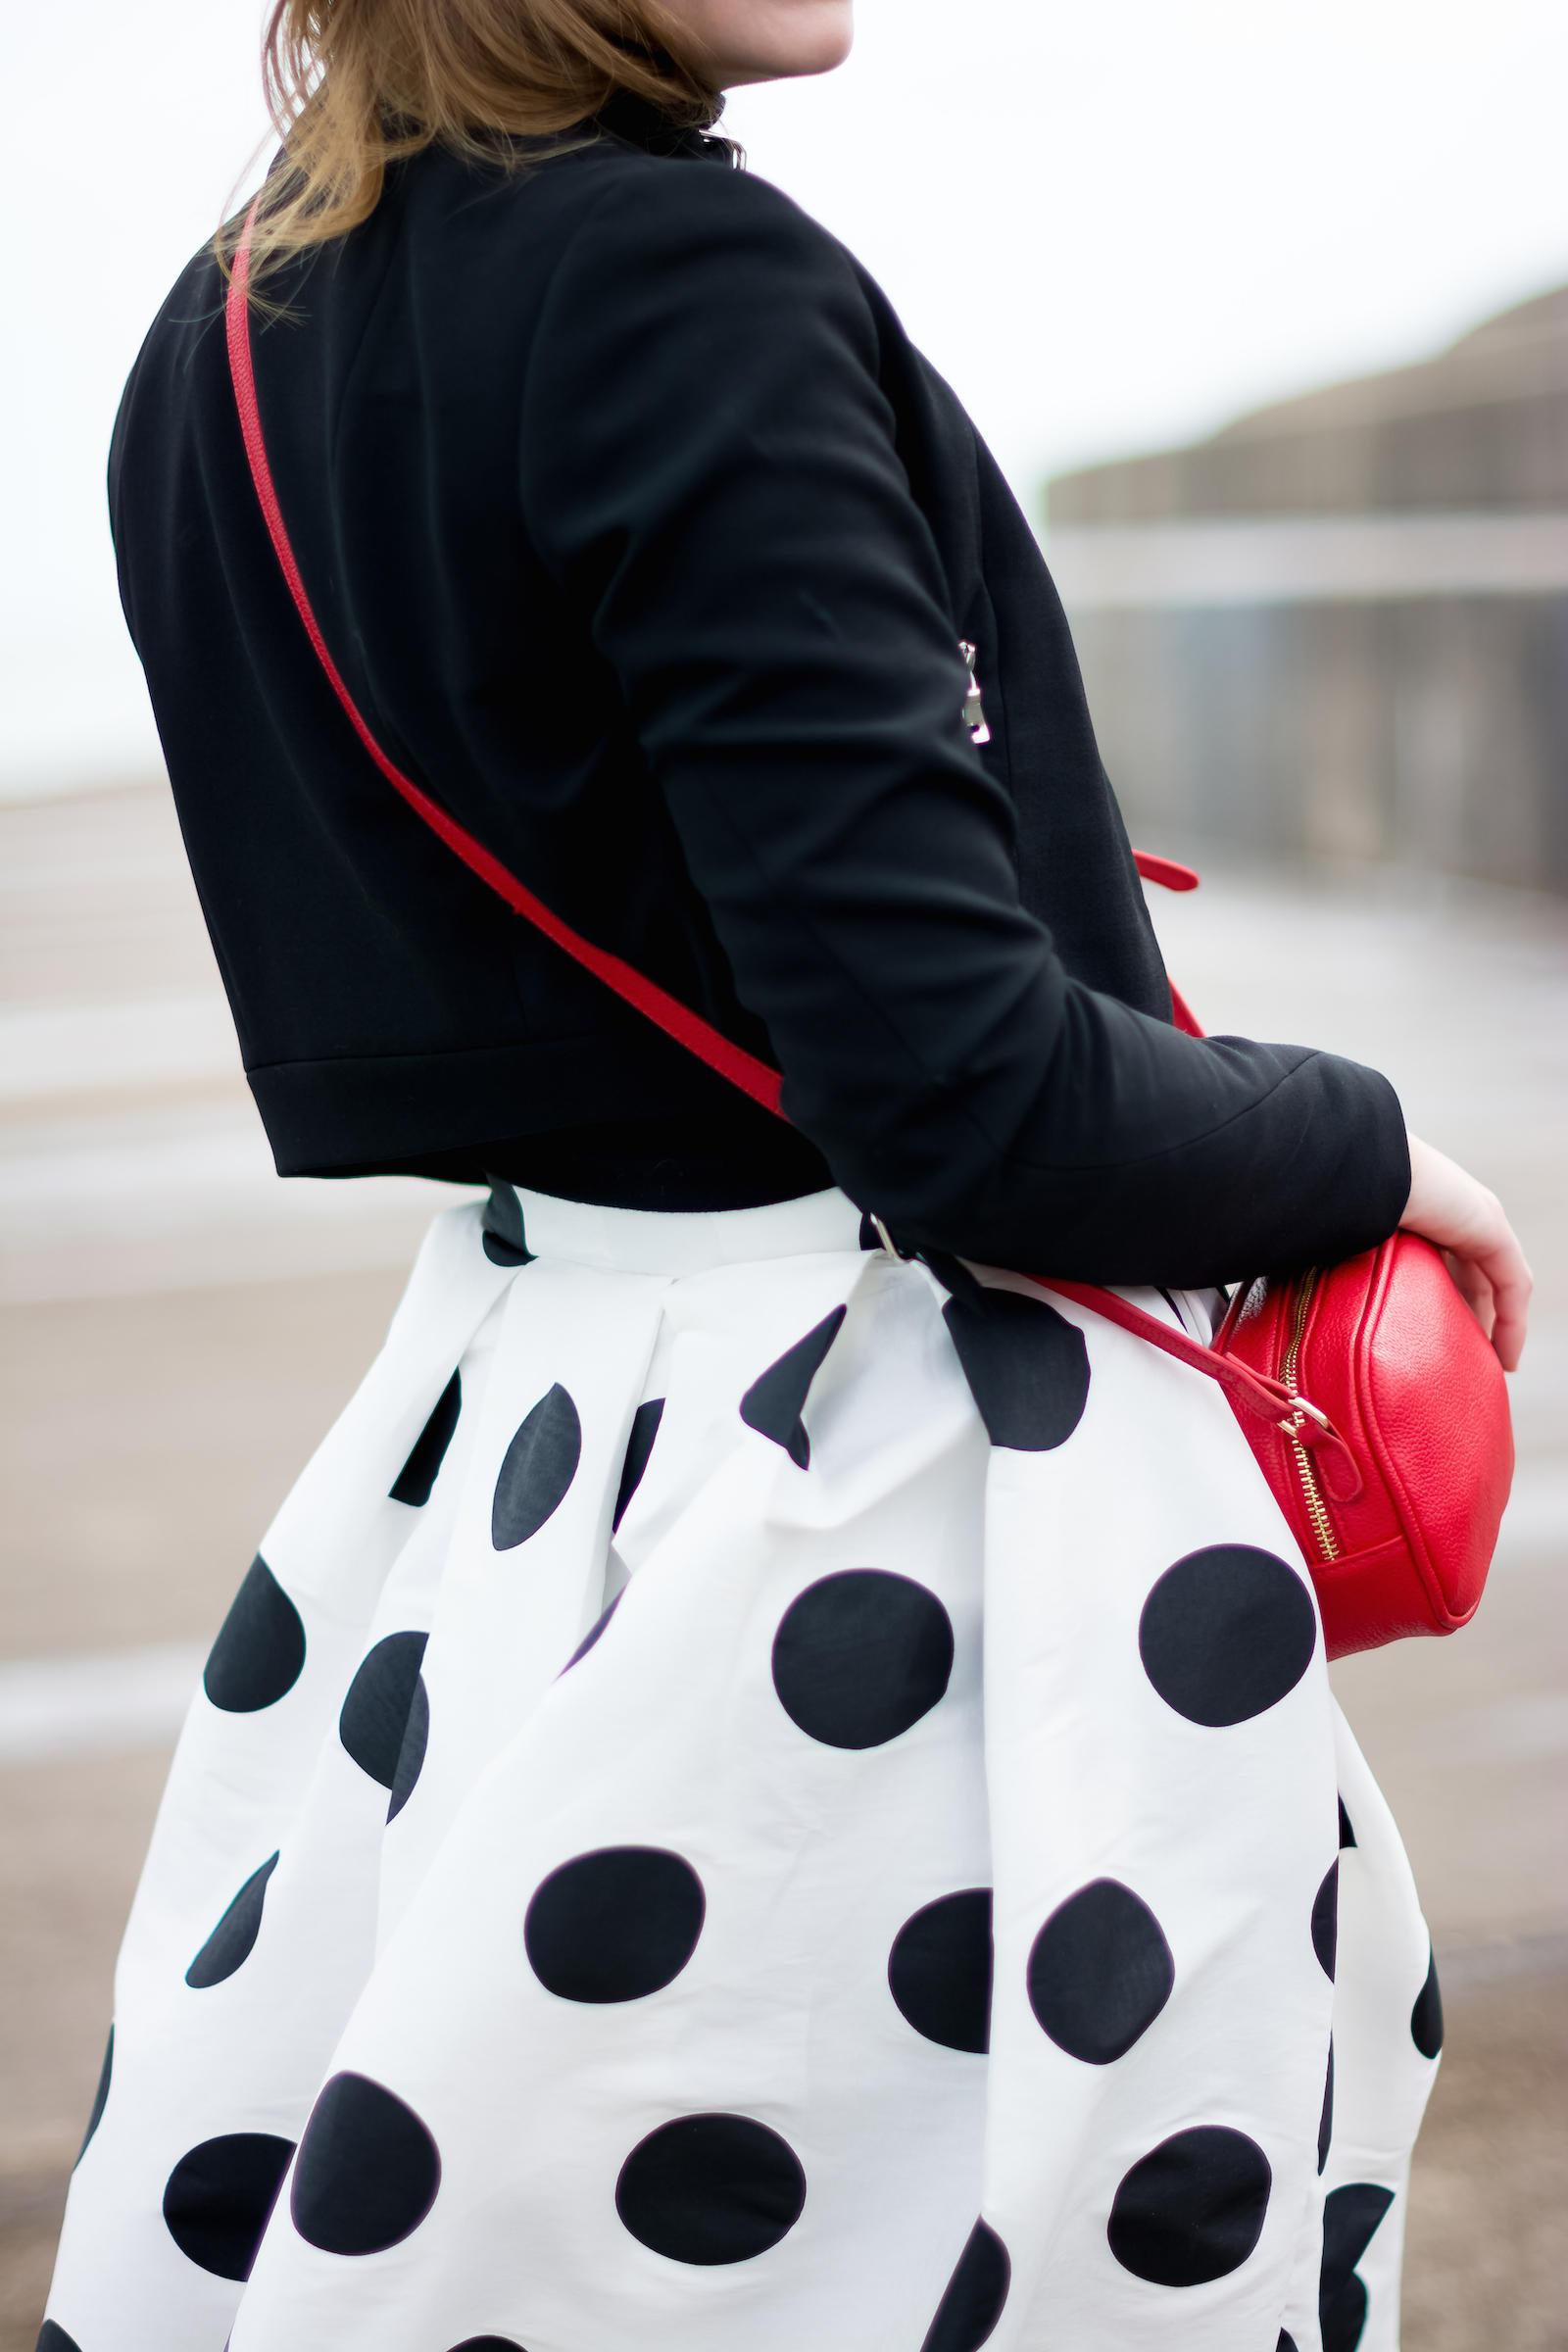 Zara Moto Jacket T&J Designs Polka Dot Midi Skirt